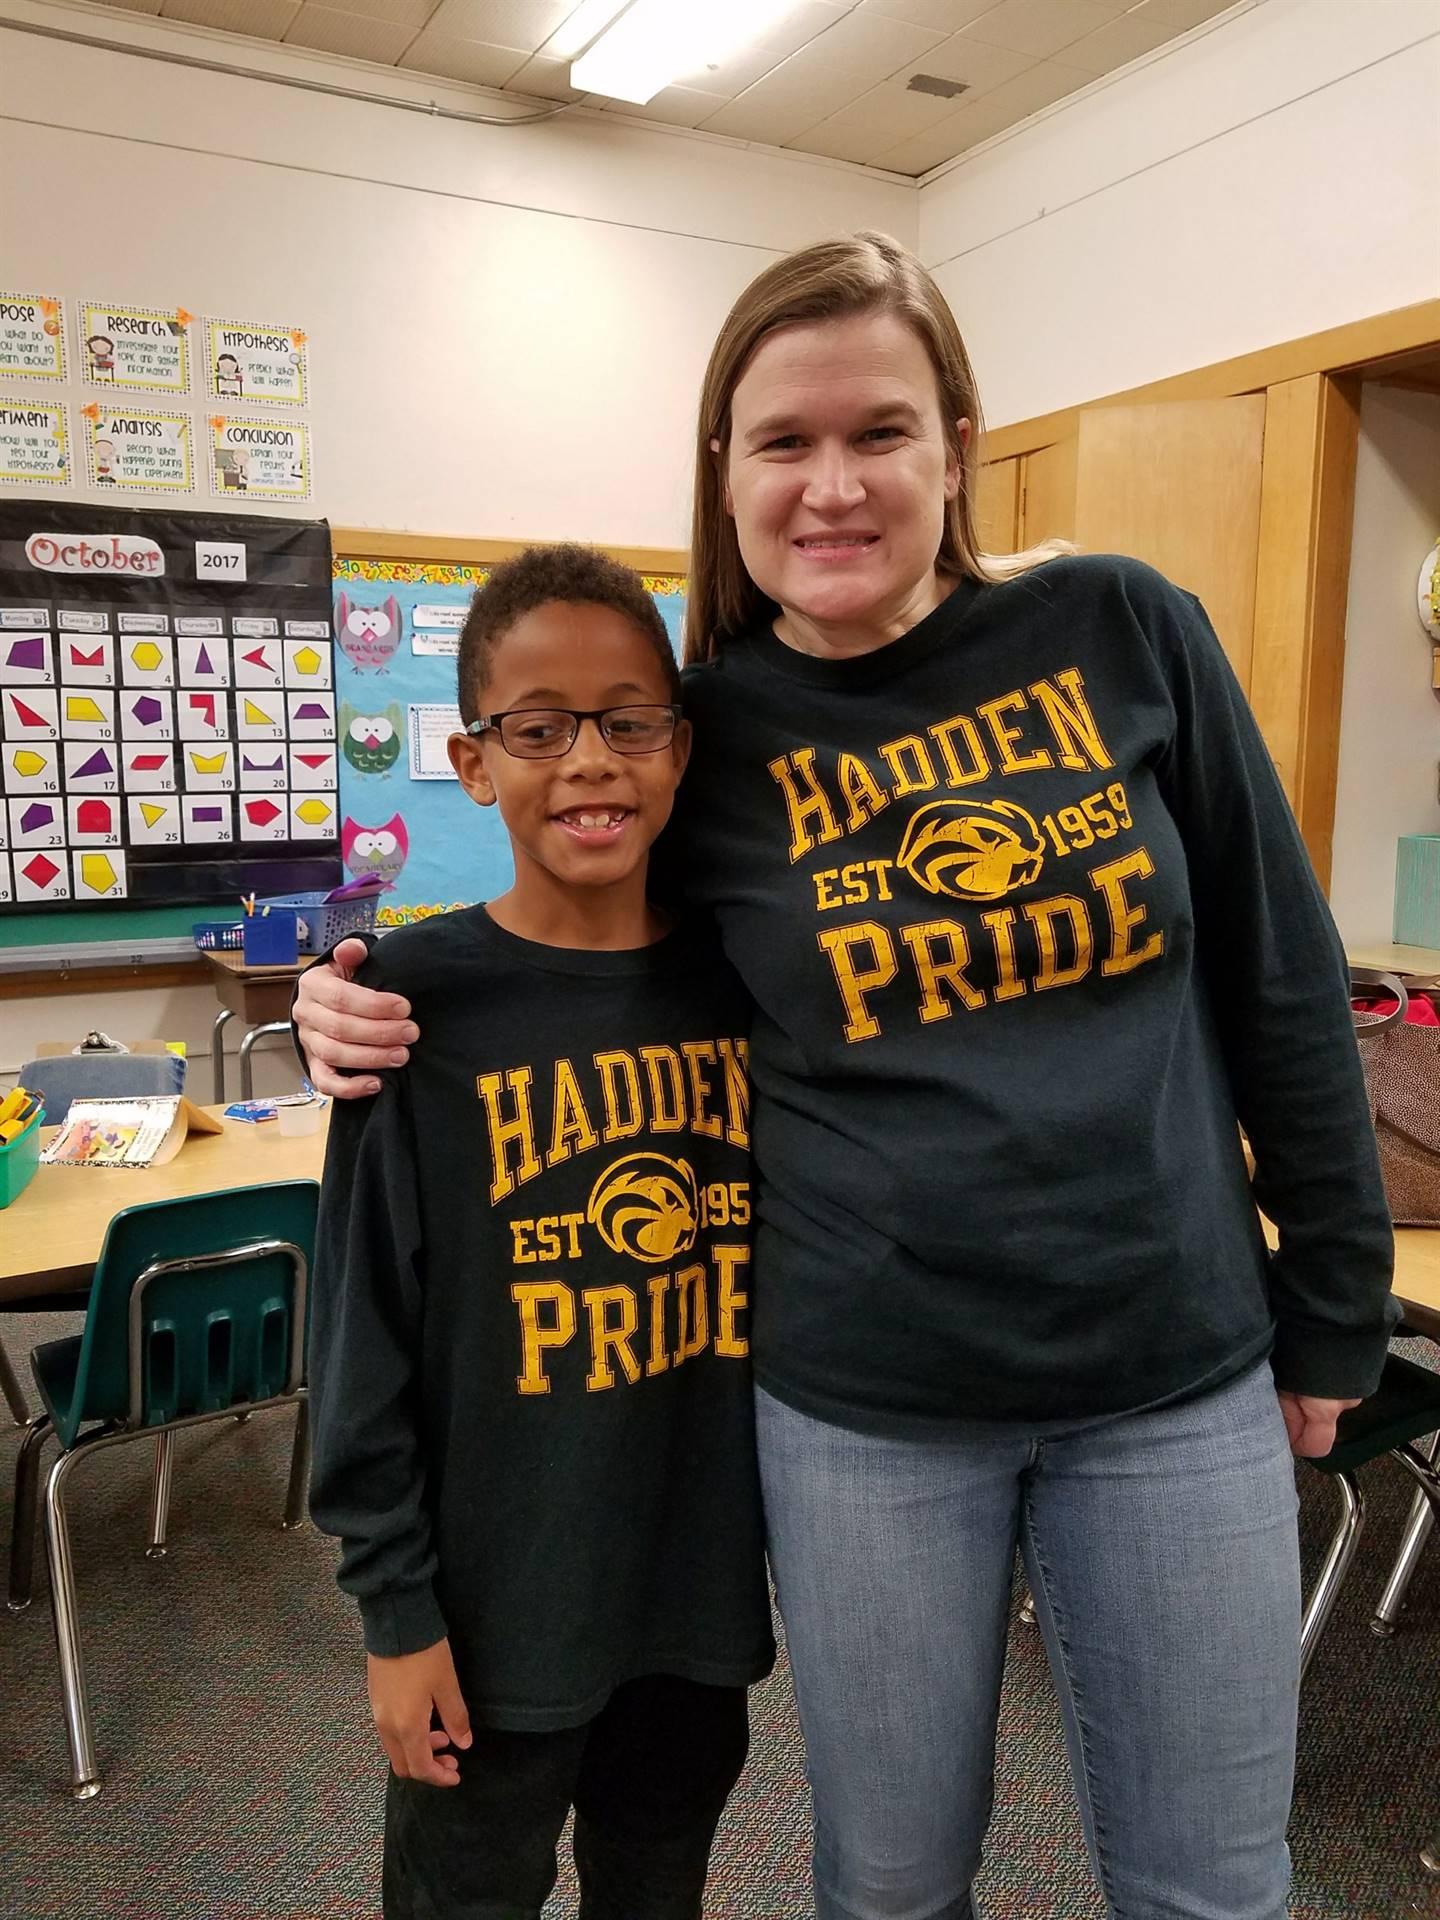 Hadden Pride